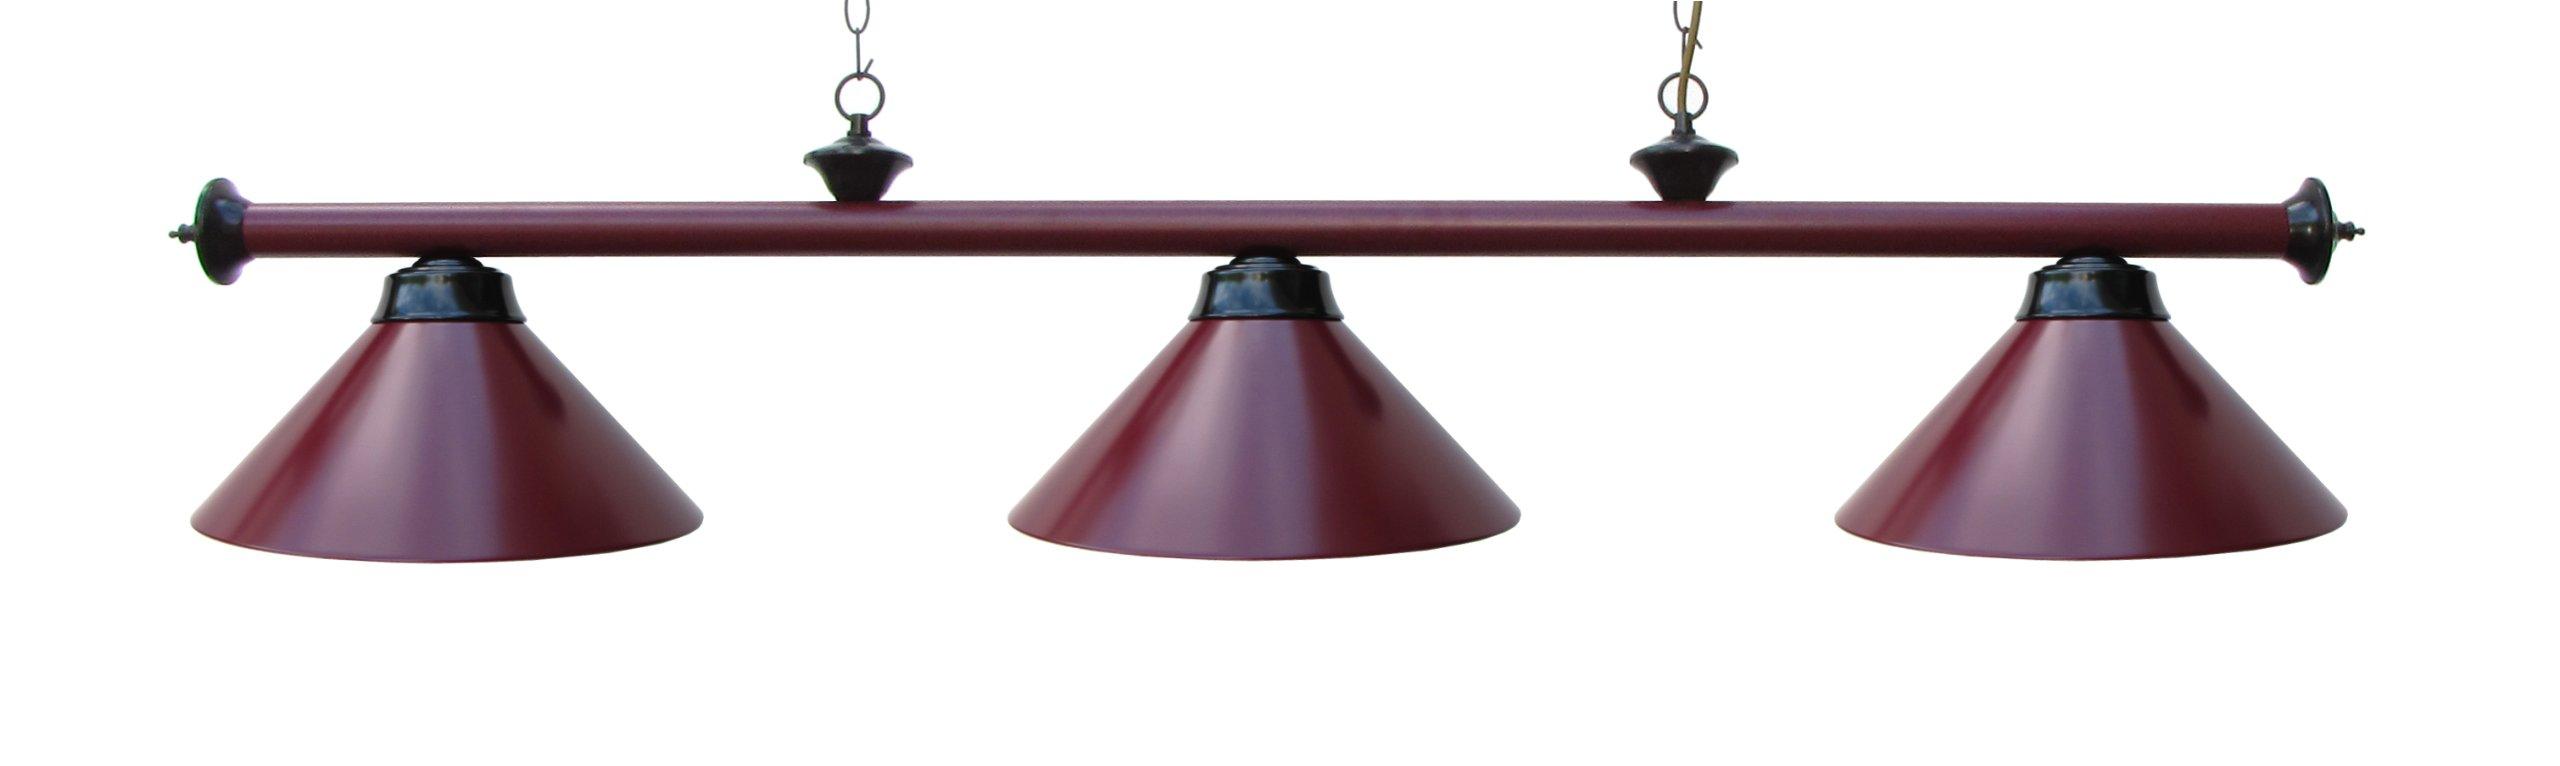 "59"" Metal Pool Table Light Billiard Lamp Green"